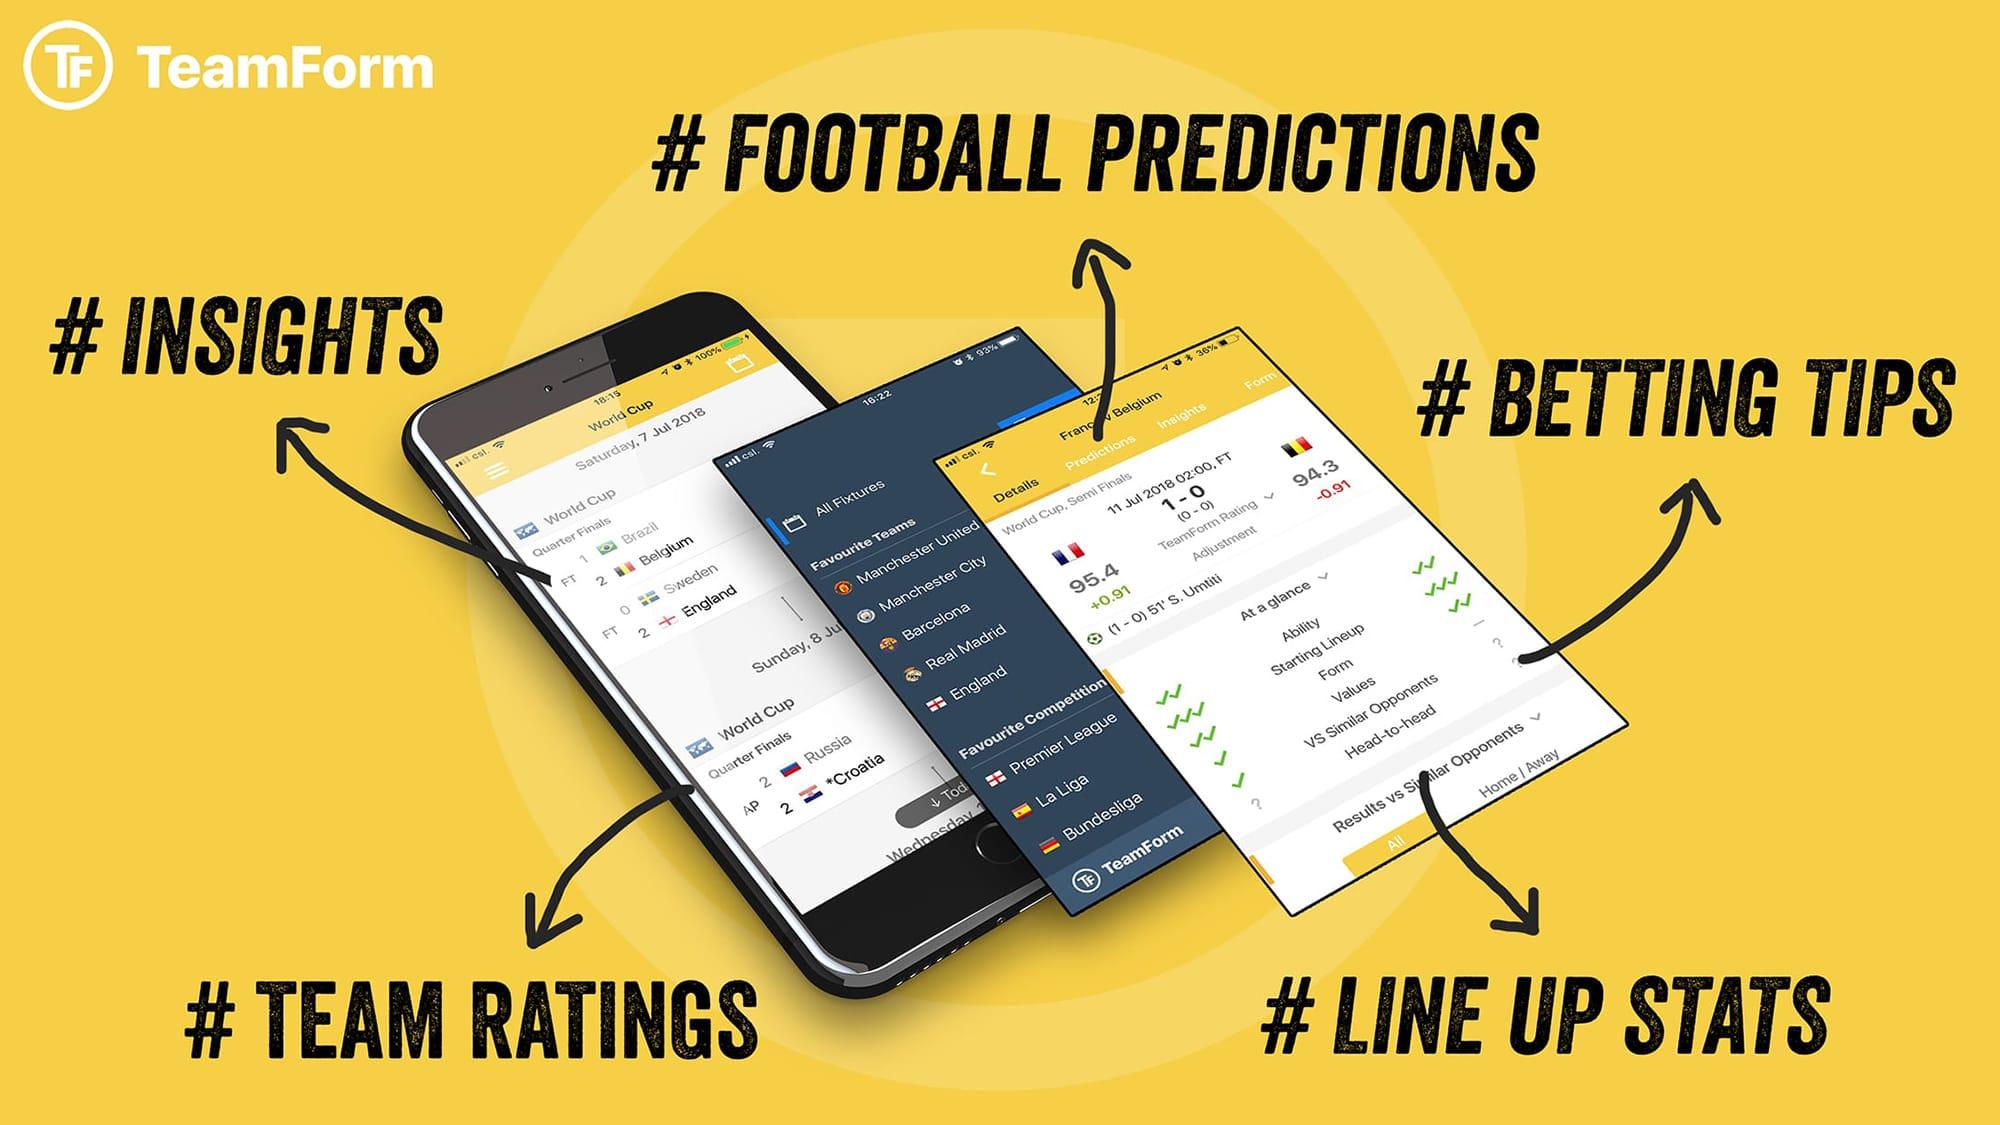 TeamForm Official Mobile App - The Ulitmate Football Ratings